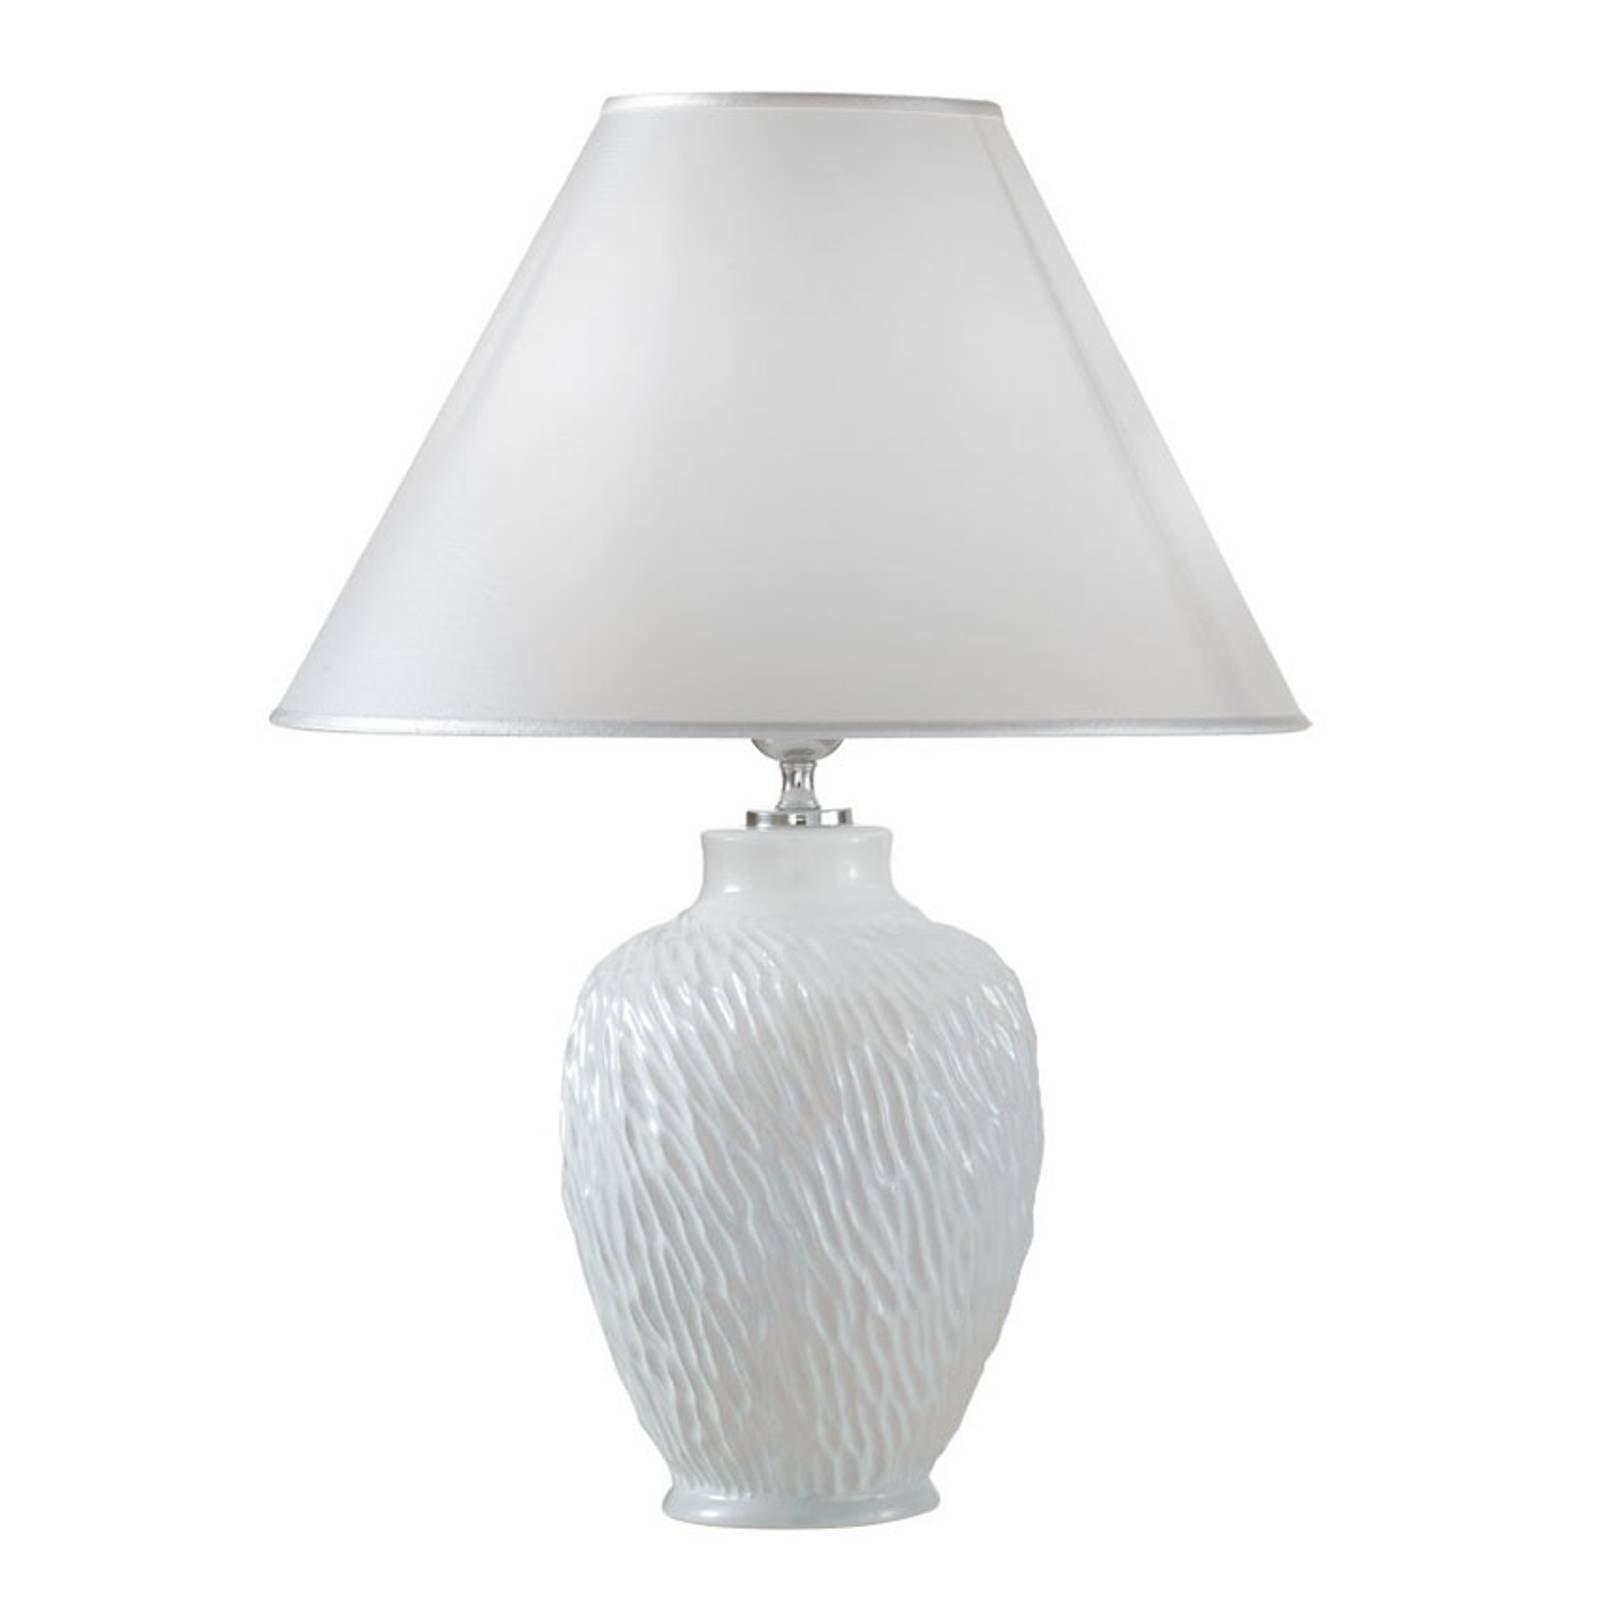 Bordlampe Chiara av keramikk, hvit, Ø 30 cm